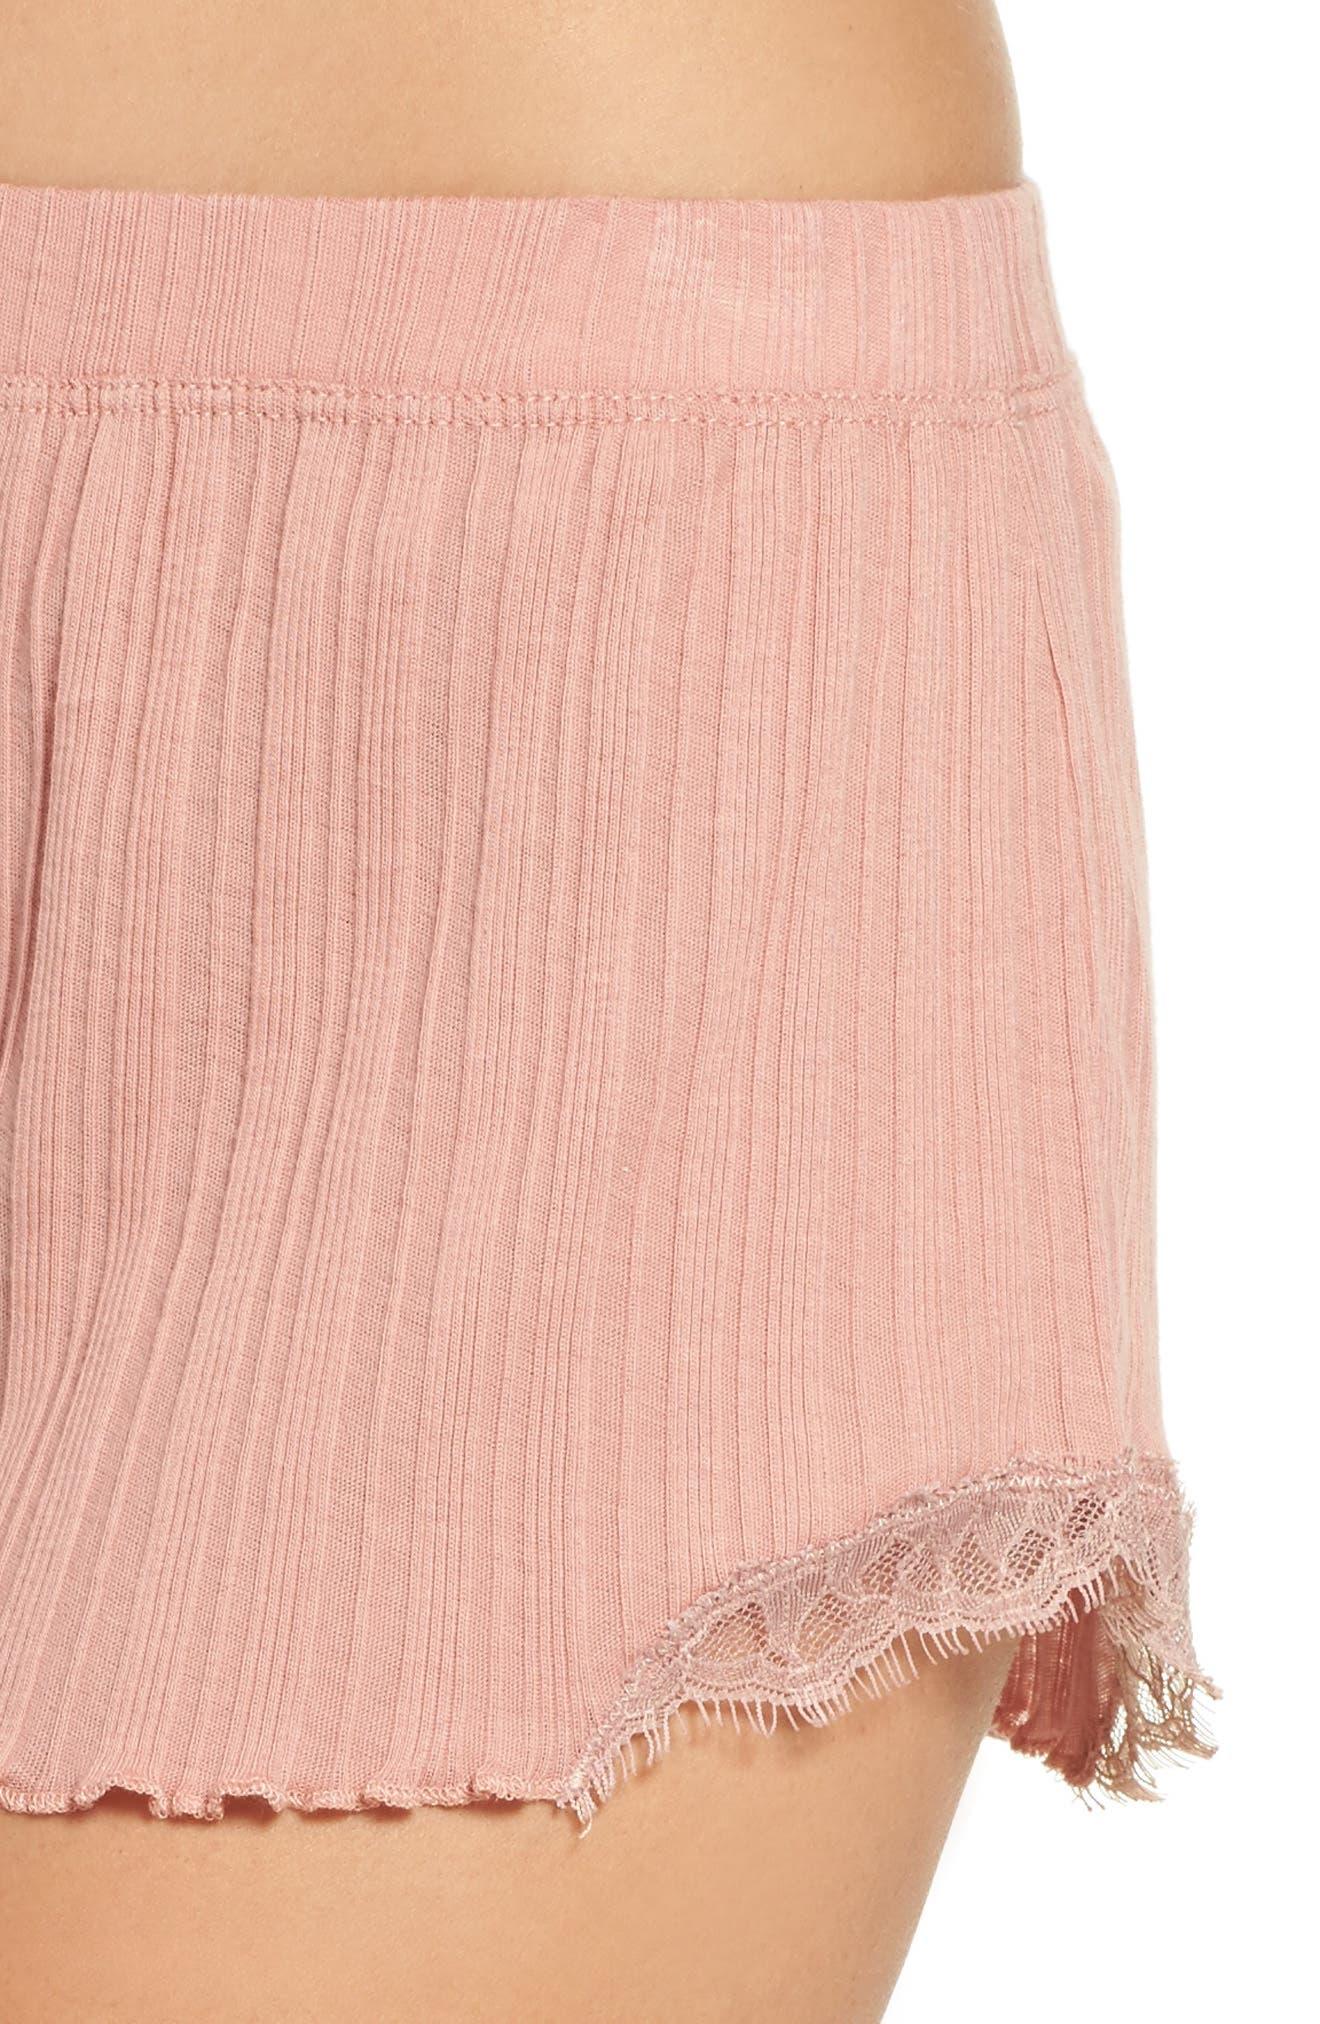 Ribbed Shorts,                             Alternate thumbnail 5, color,                             Vintage Pink